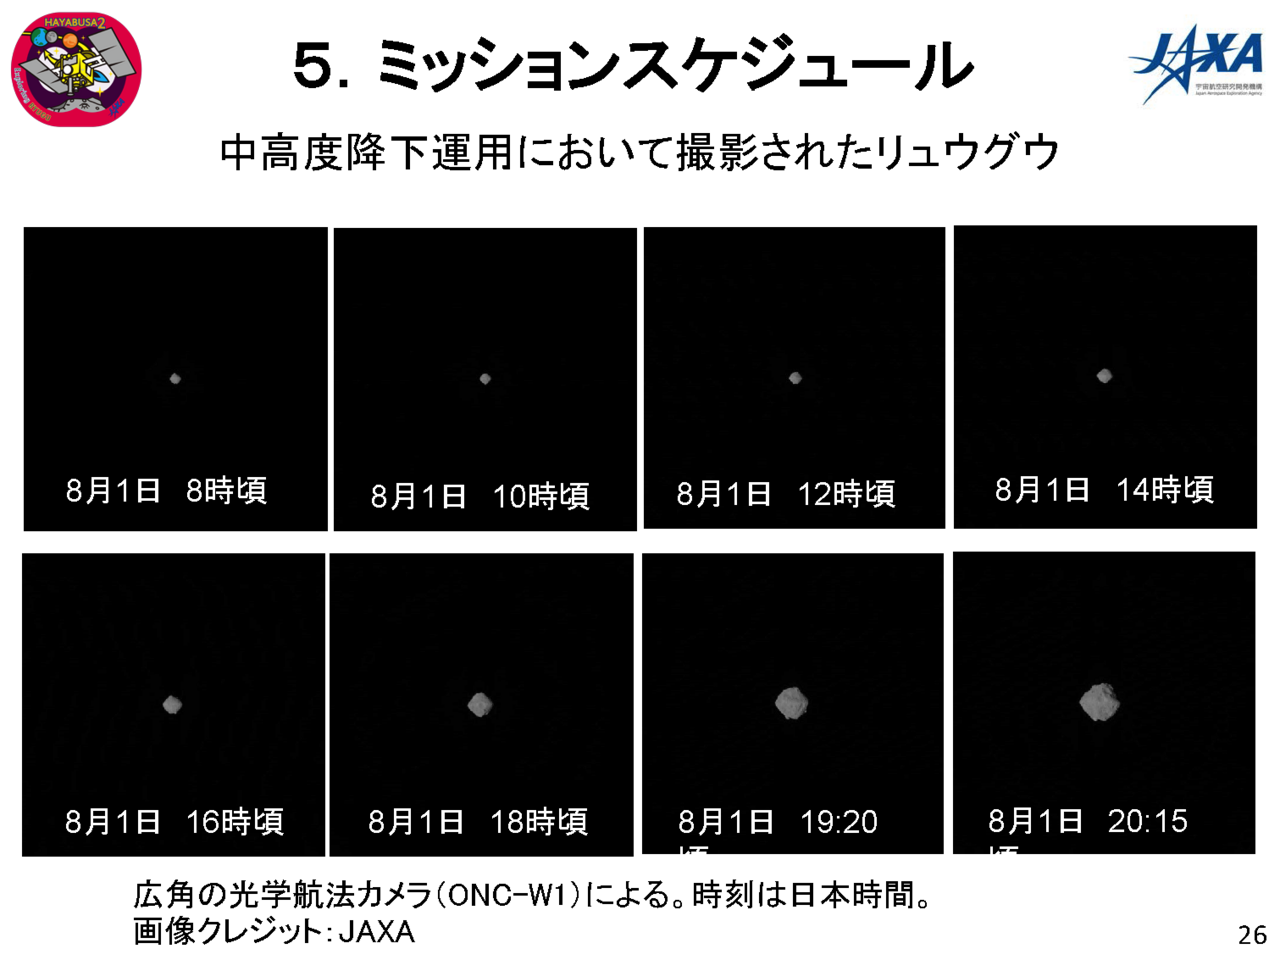 f:id:Imamura:20180802145946p:plain